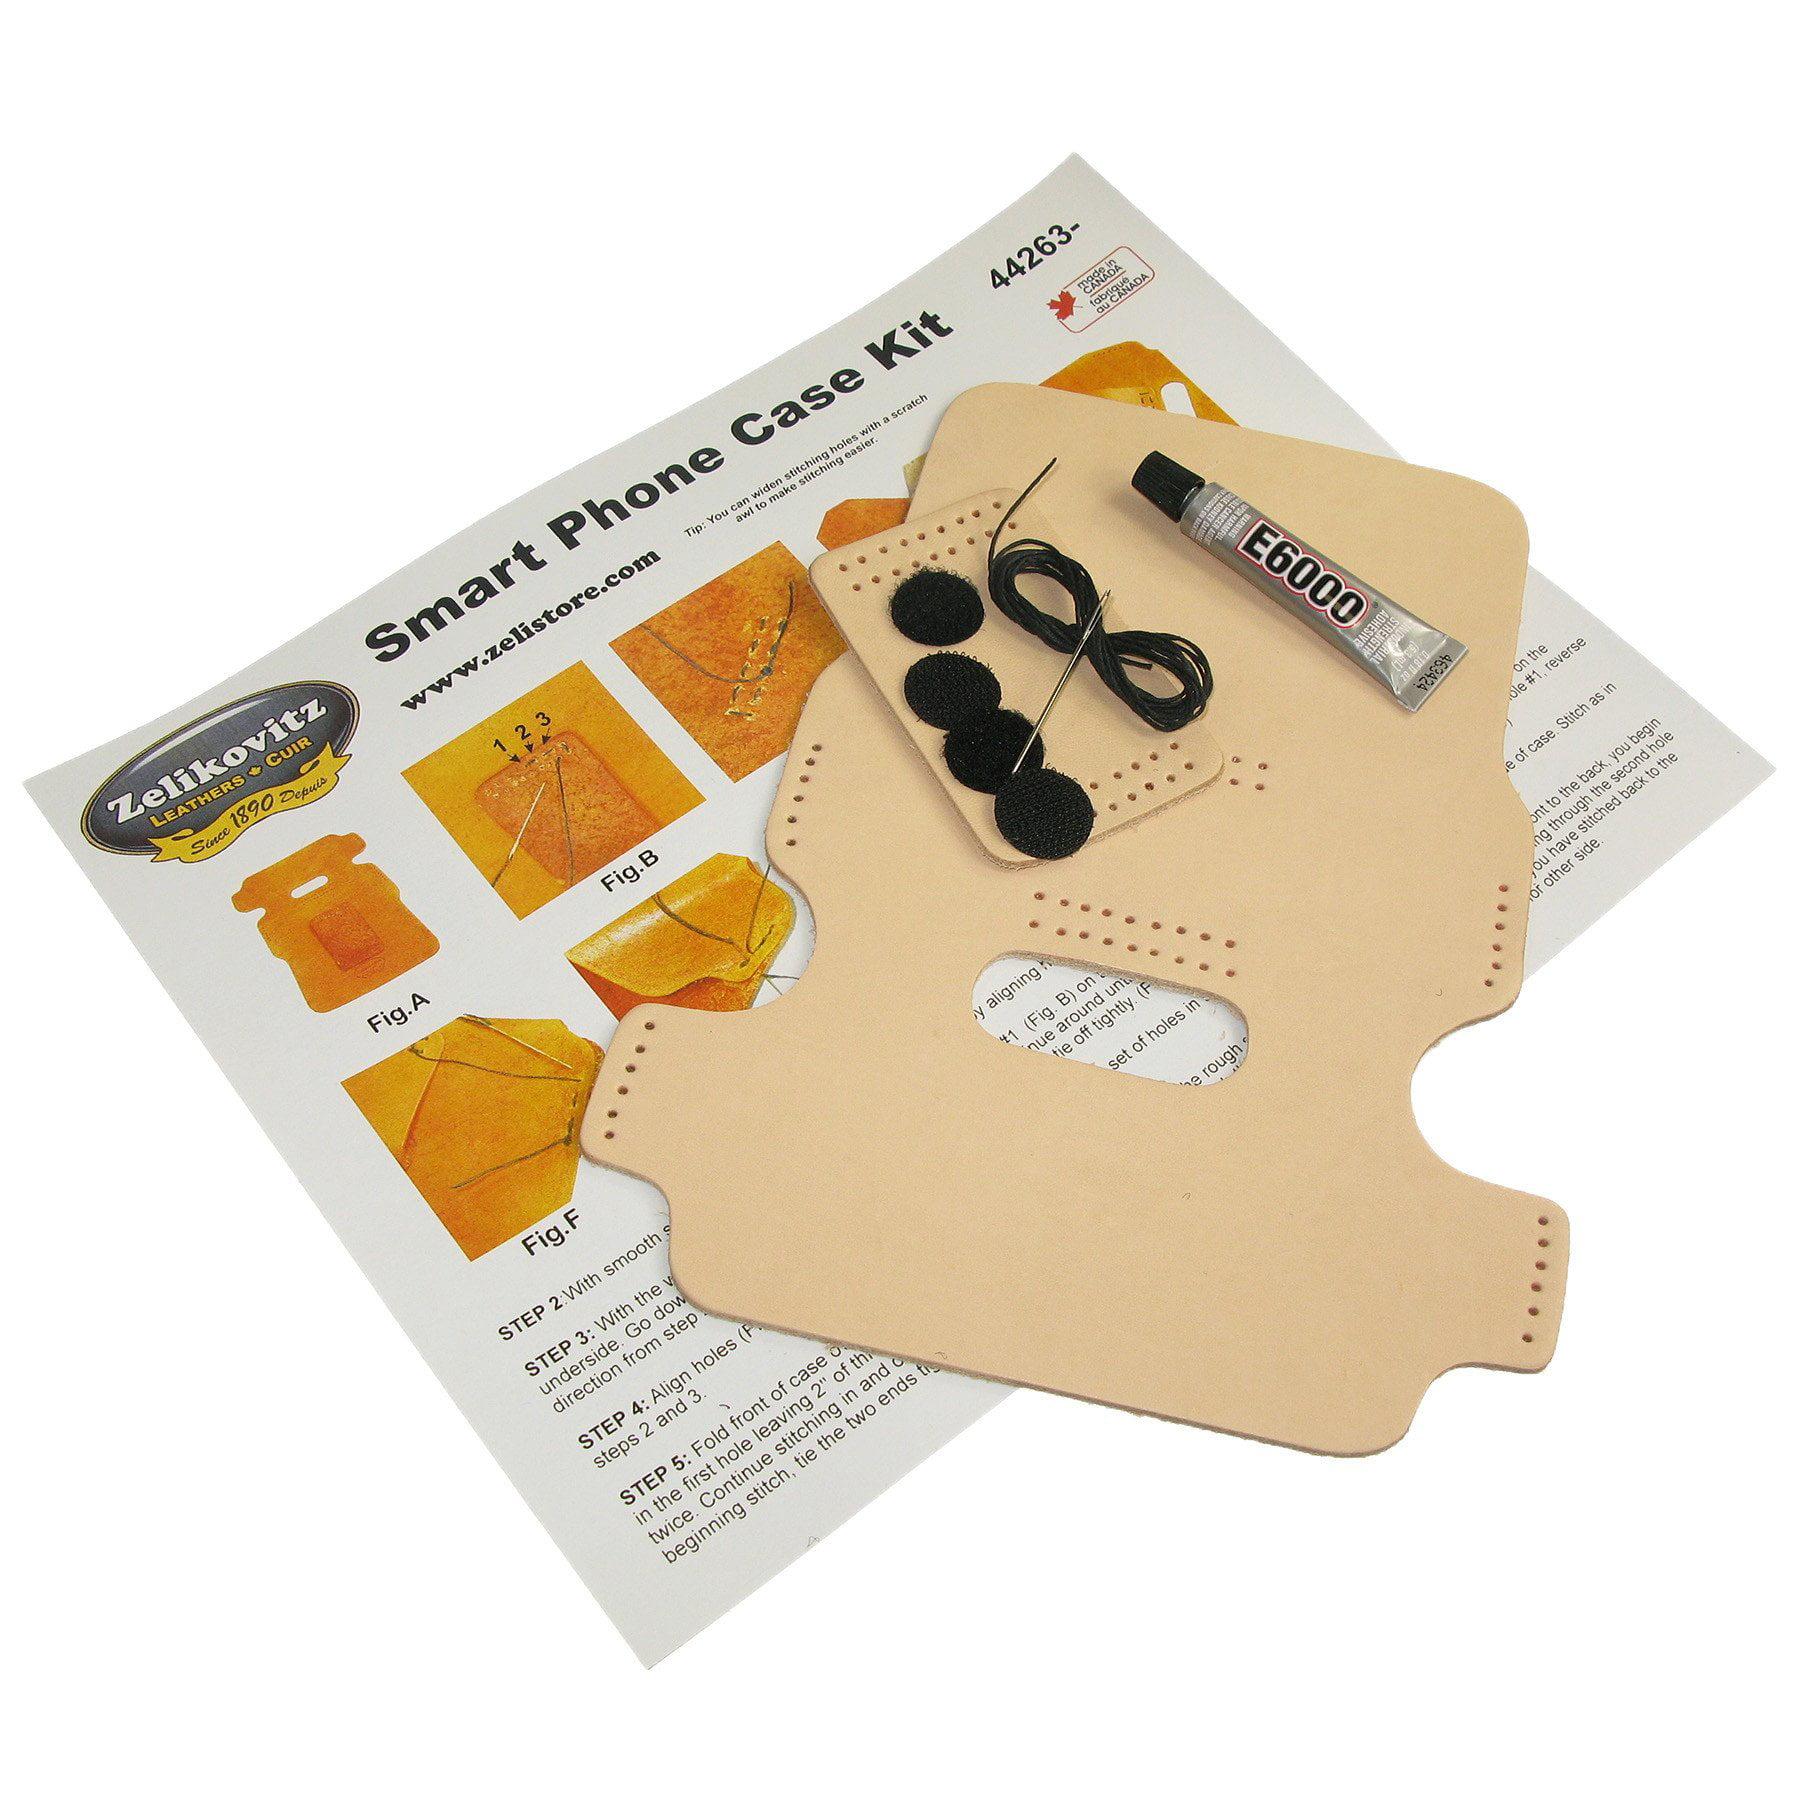 Smart Phone Case Kit  for iPhone 4/5  44263-00 - image 4 de 6